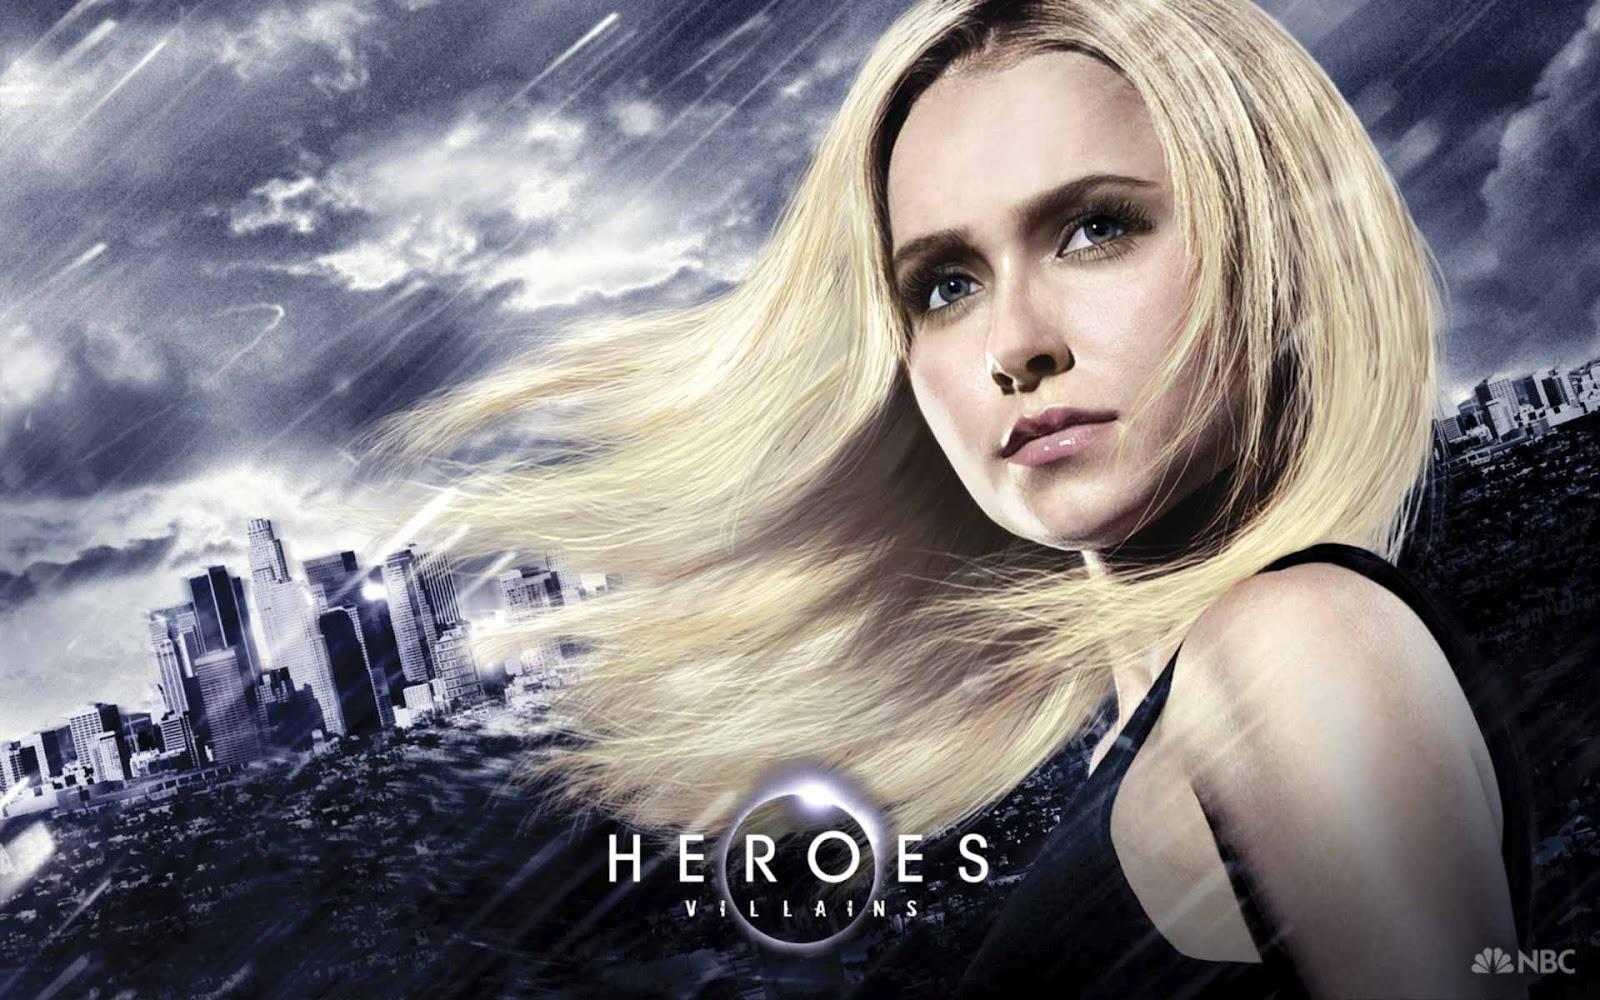 http://3.bp.blogspot.com/-F9ZQ38ICoM8/UC9qxZiOdWI/AAAAAAAAGes/FxhLJLtwNqw/s1600/Hayden+Panettiere+Heroes+Tv+Series+-+Celebrity+Close-Ups+Wallpapers.jpg